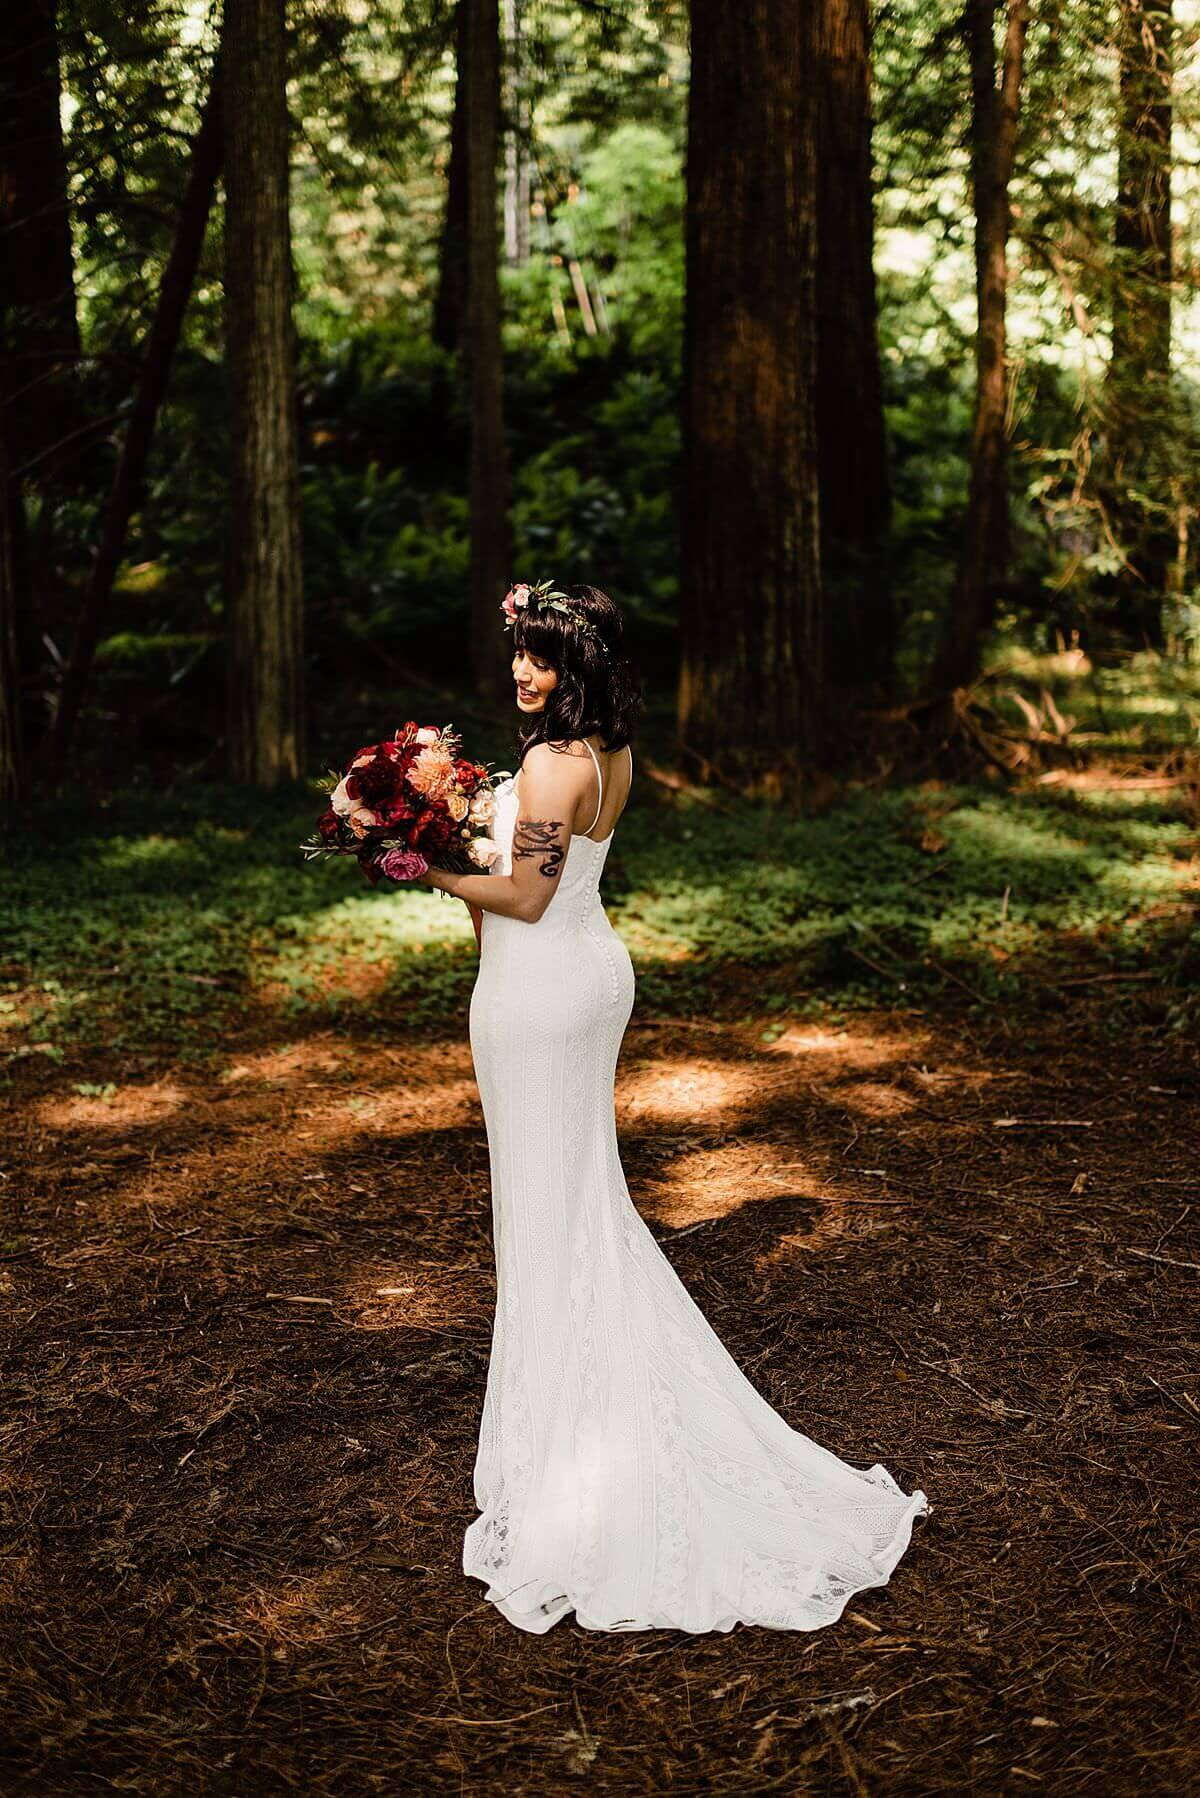 Allison-Brooks-Jedediah-Smiith-Redwoods-Adventure-Elopement-Wedding-S-Photography-Blog_0007.jpg